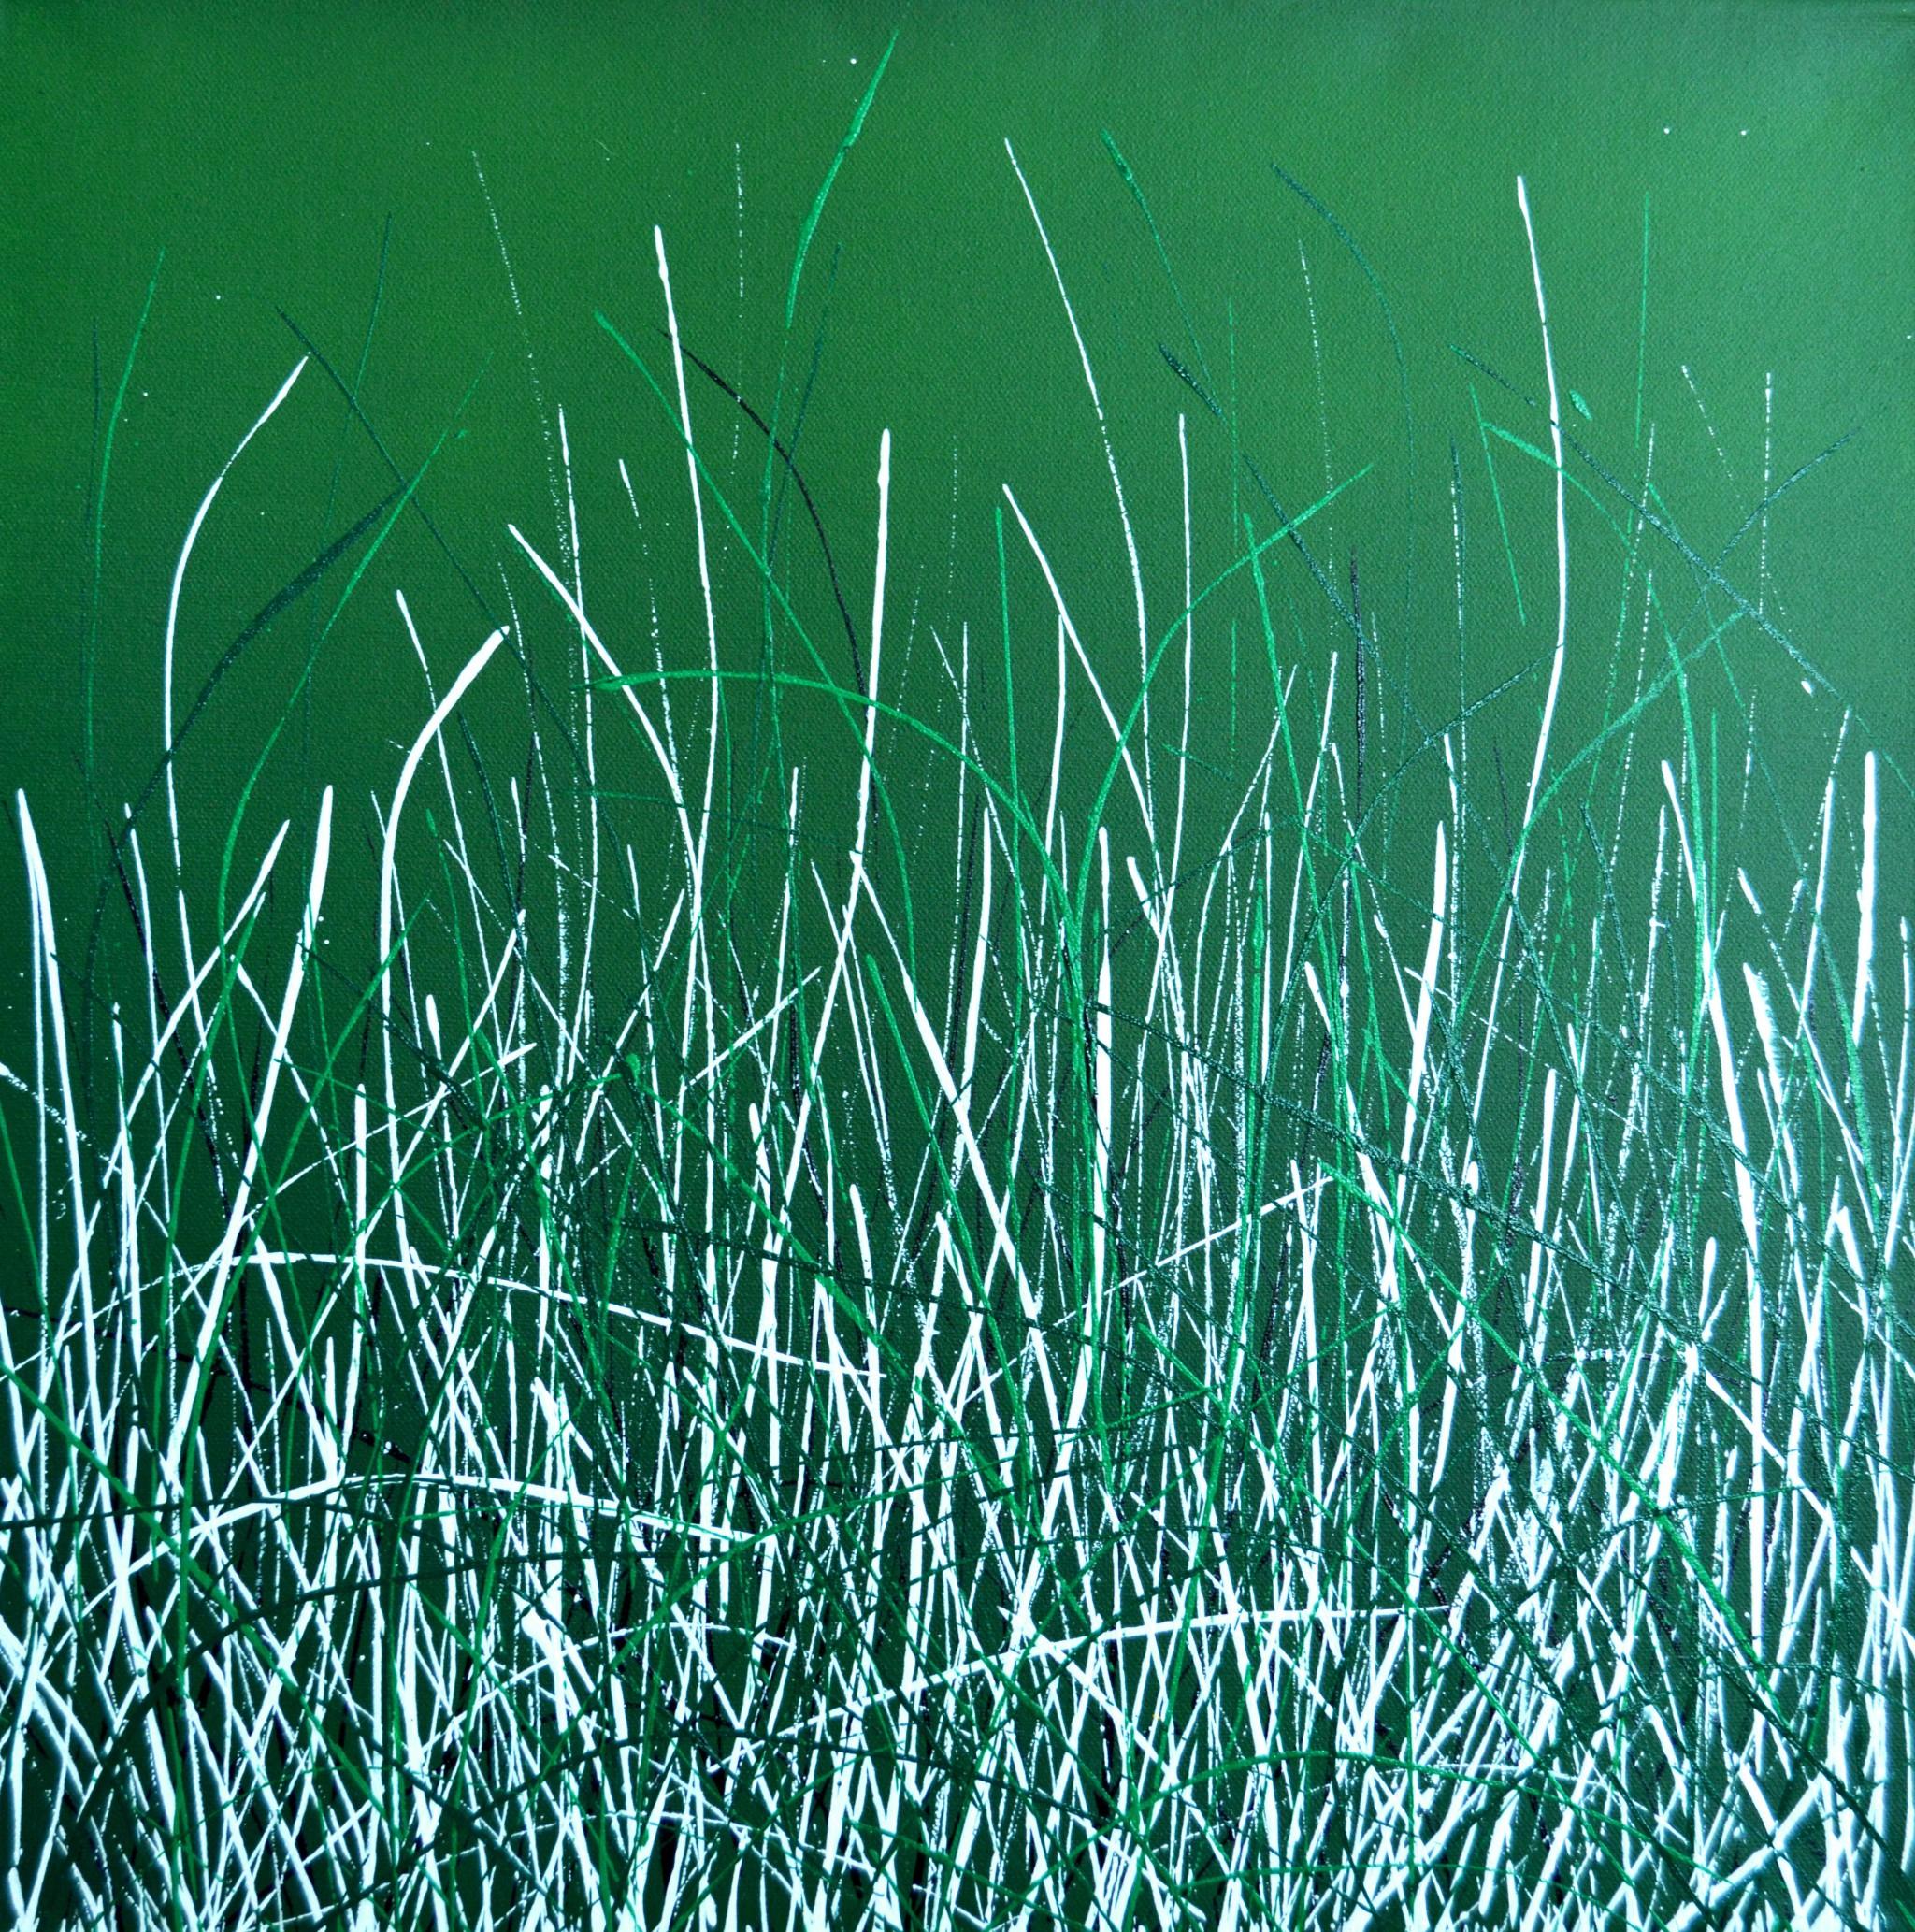 Öl/Lack/Leinwand, 50 x 50 cm